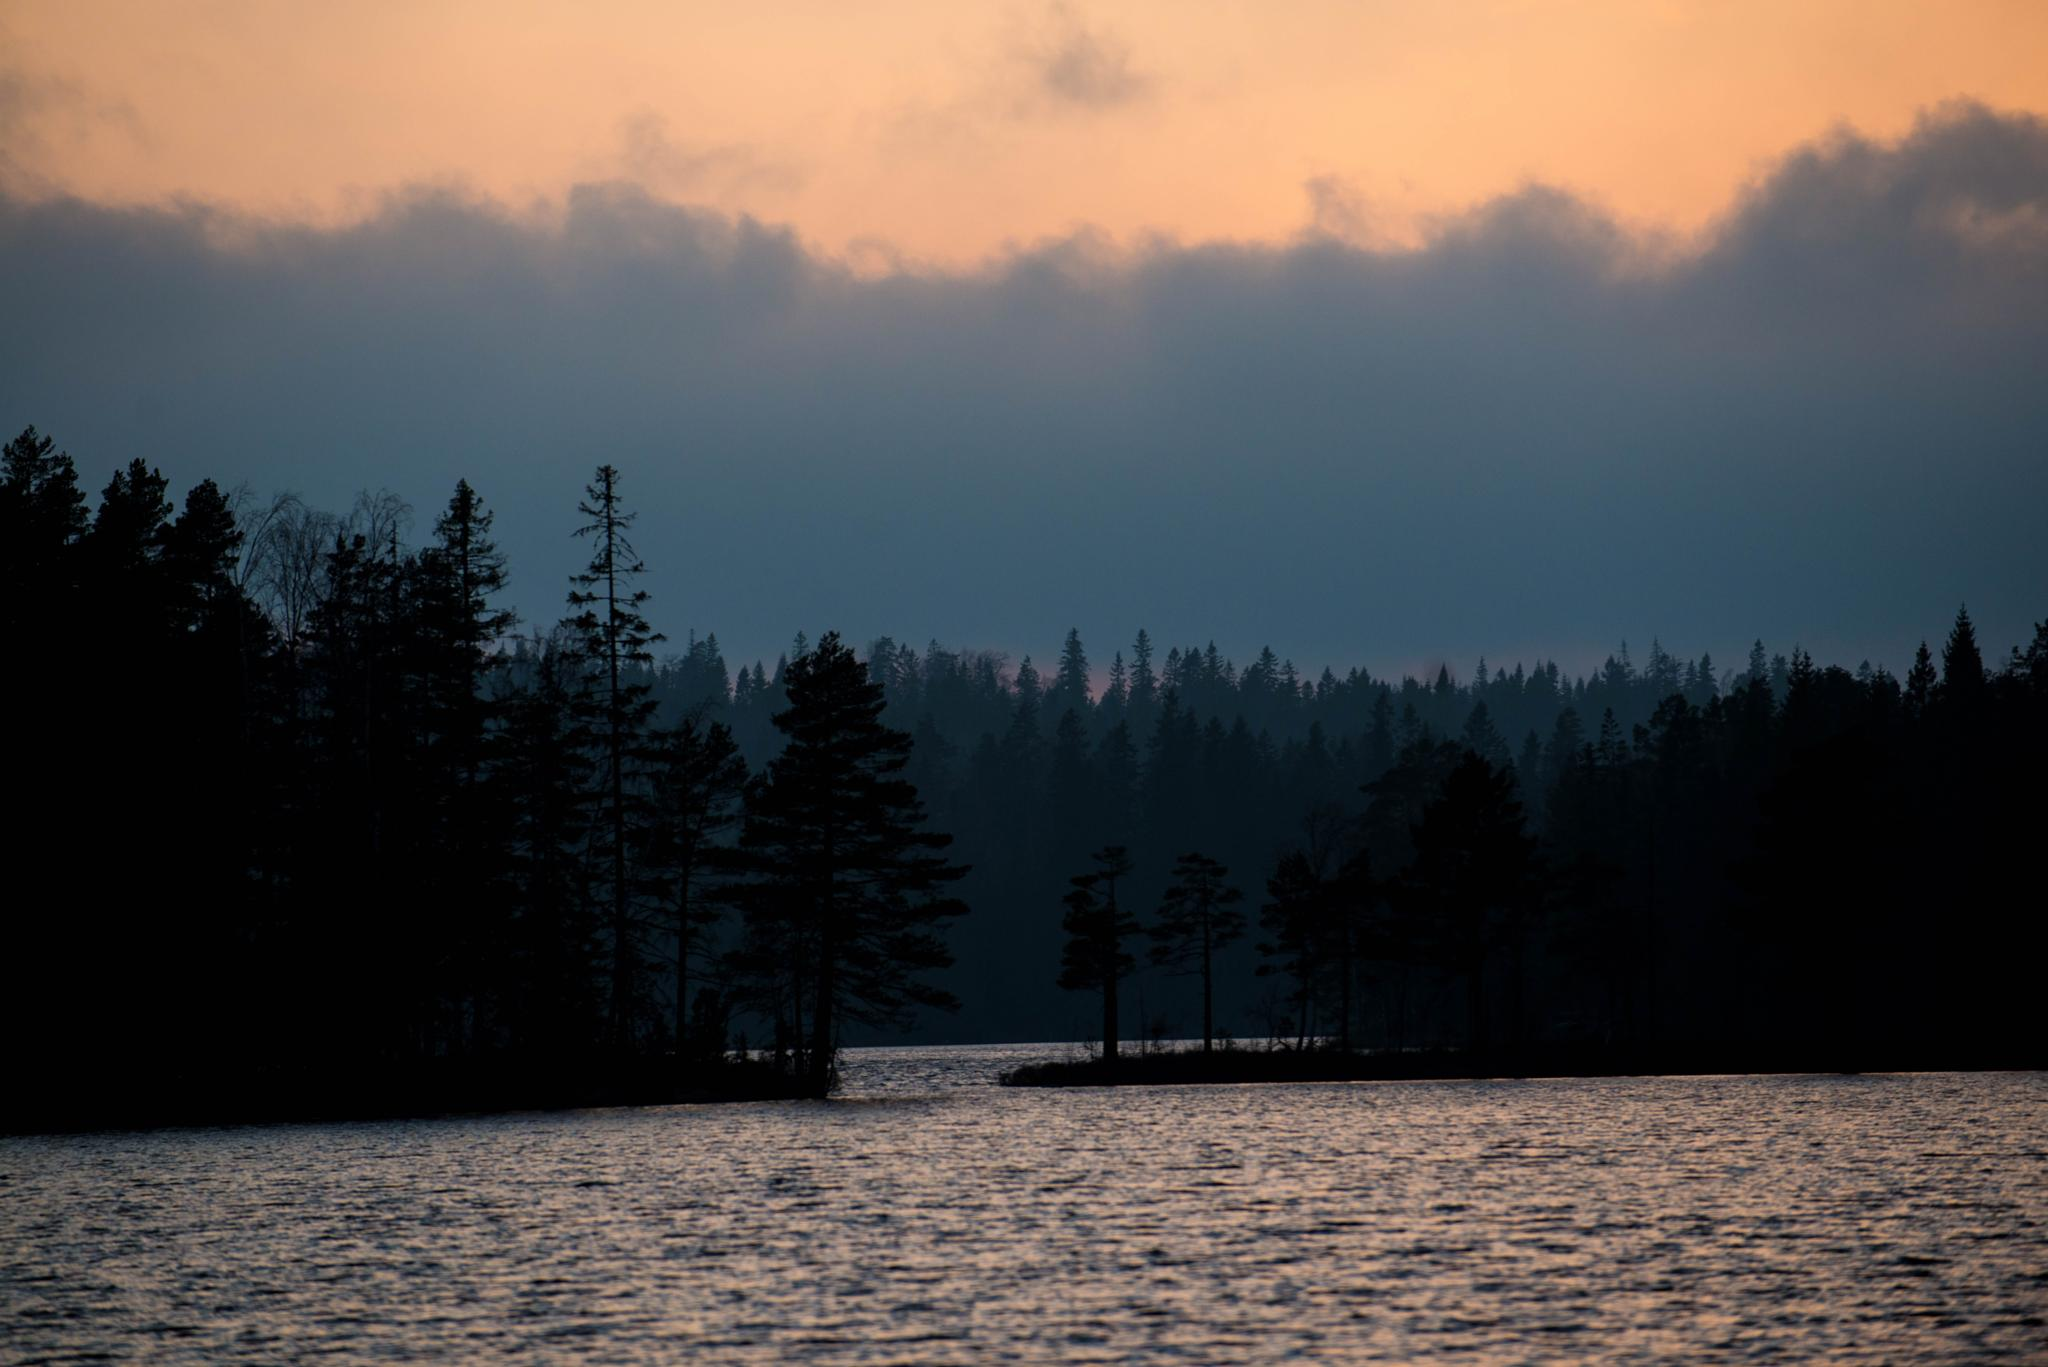 evning  att the lake by lars-goran6